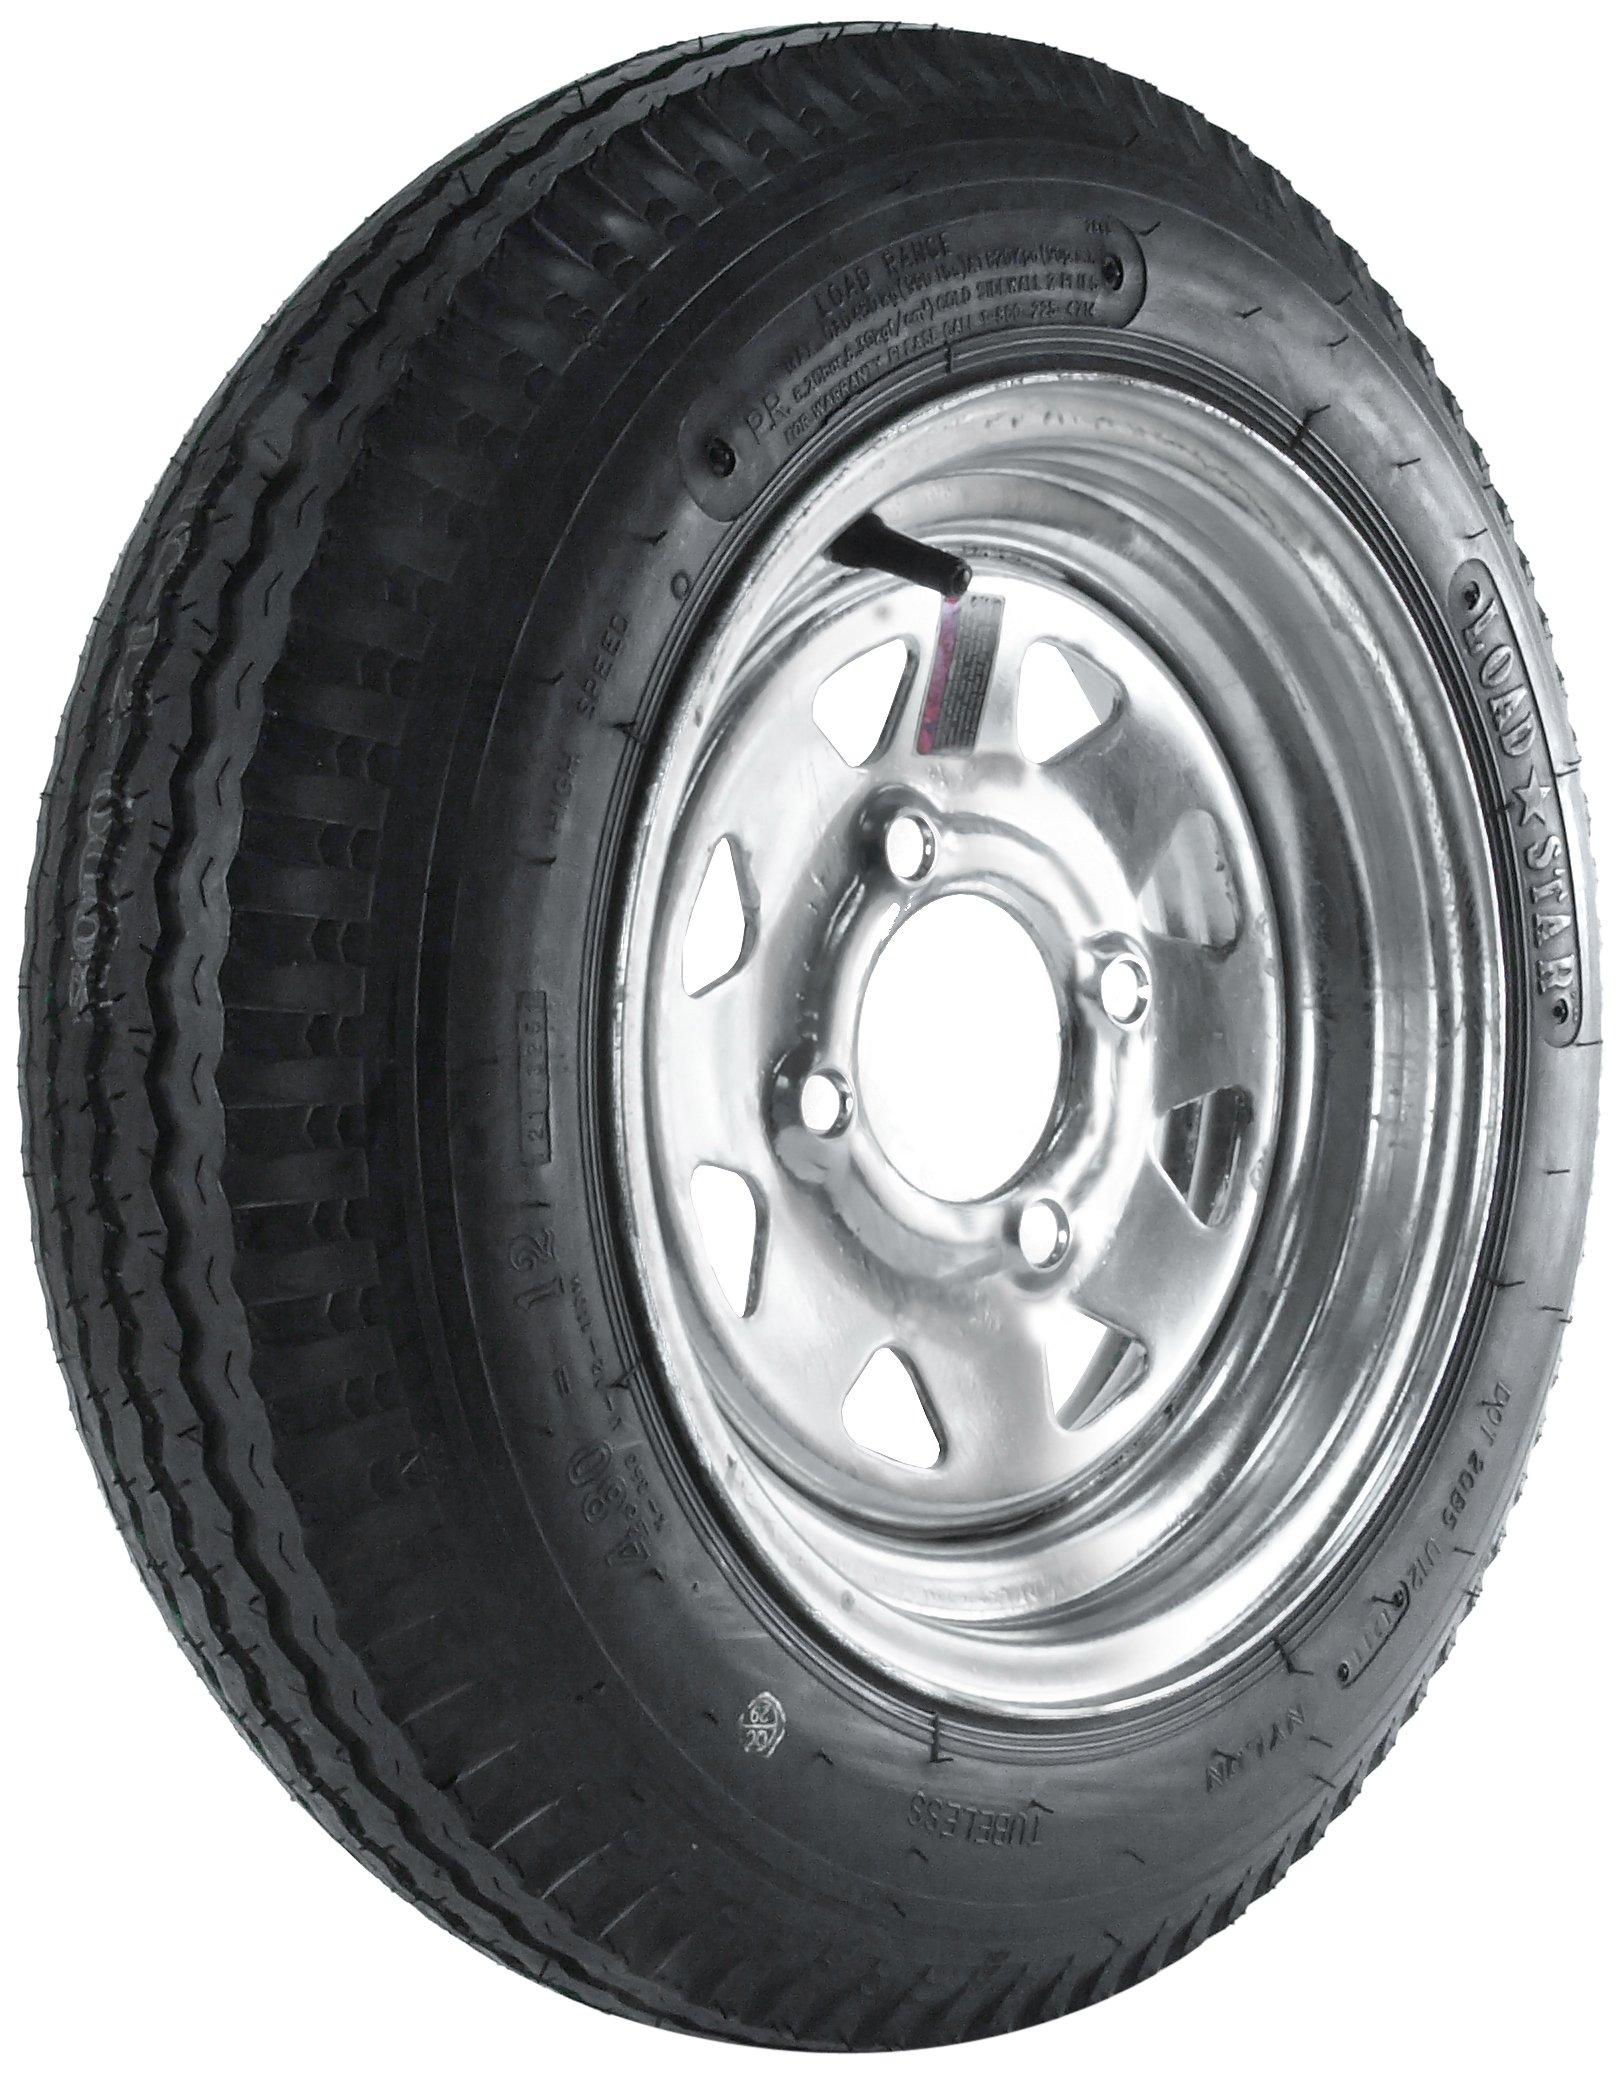 Kenda Loadstar (12x4/4x4) Galvanized Spoke Wheel with Steel Finish LRB and Trailer Tire Assembly (480-12)